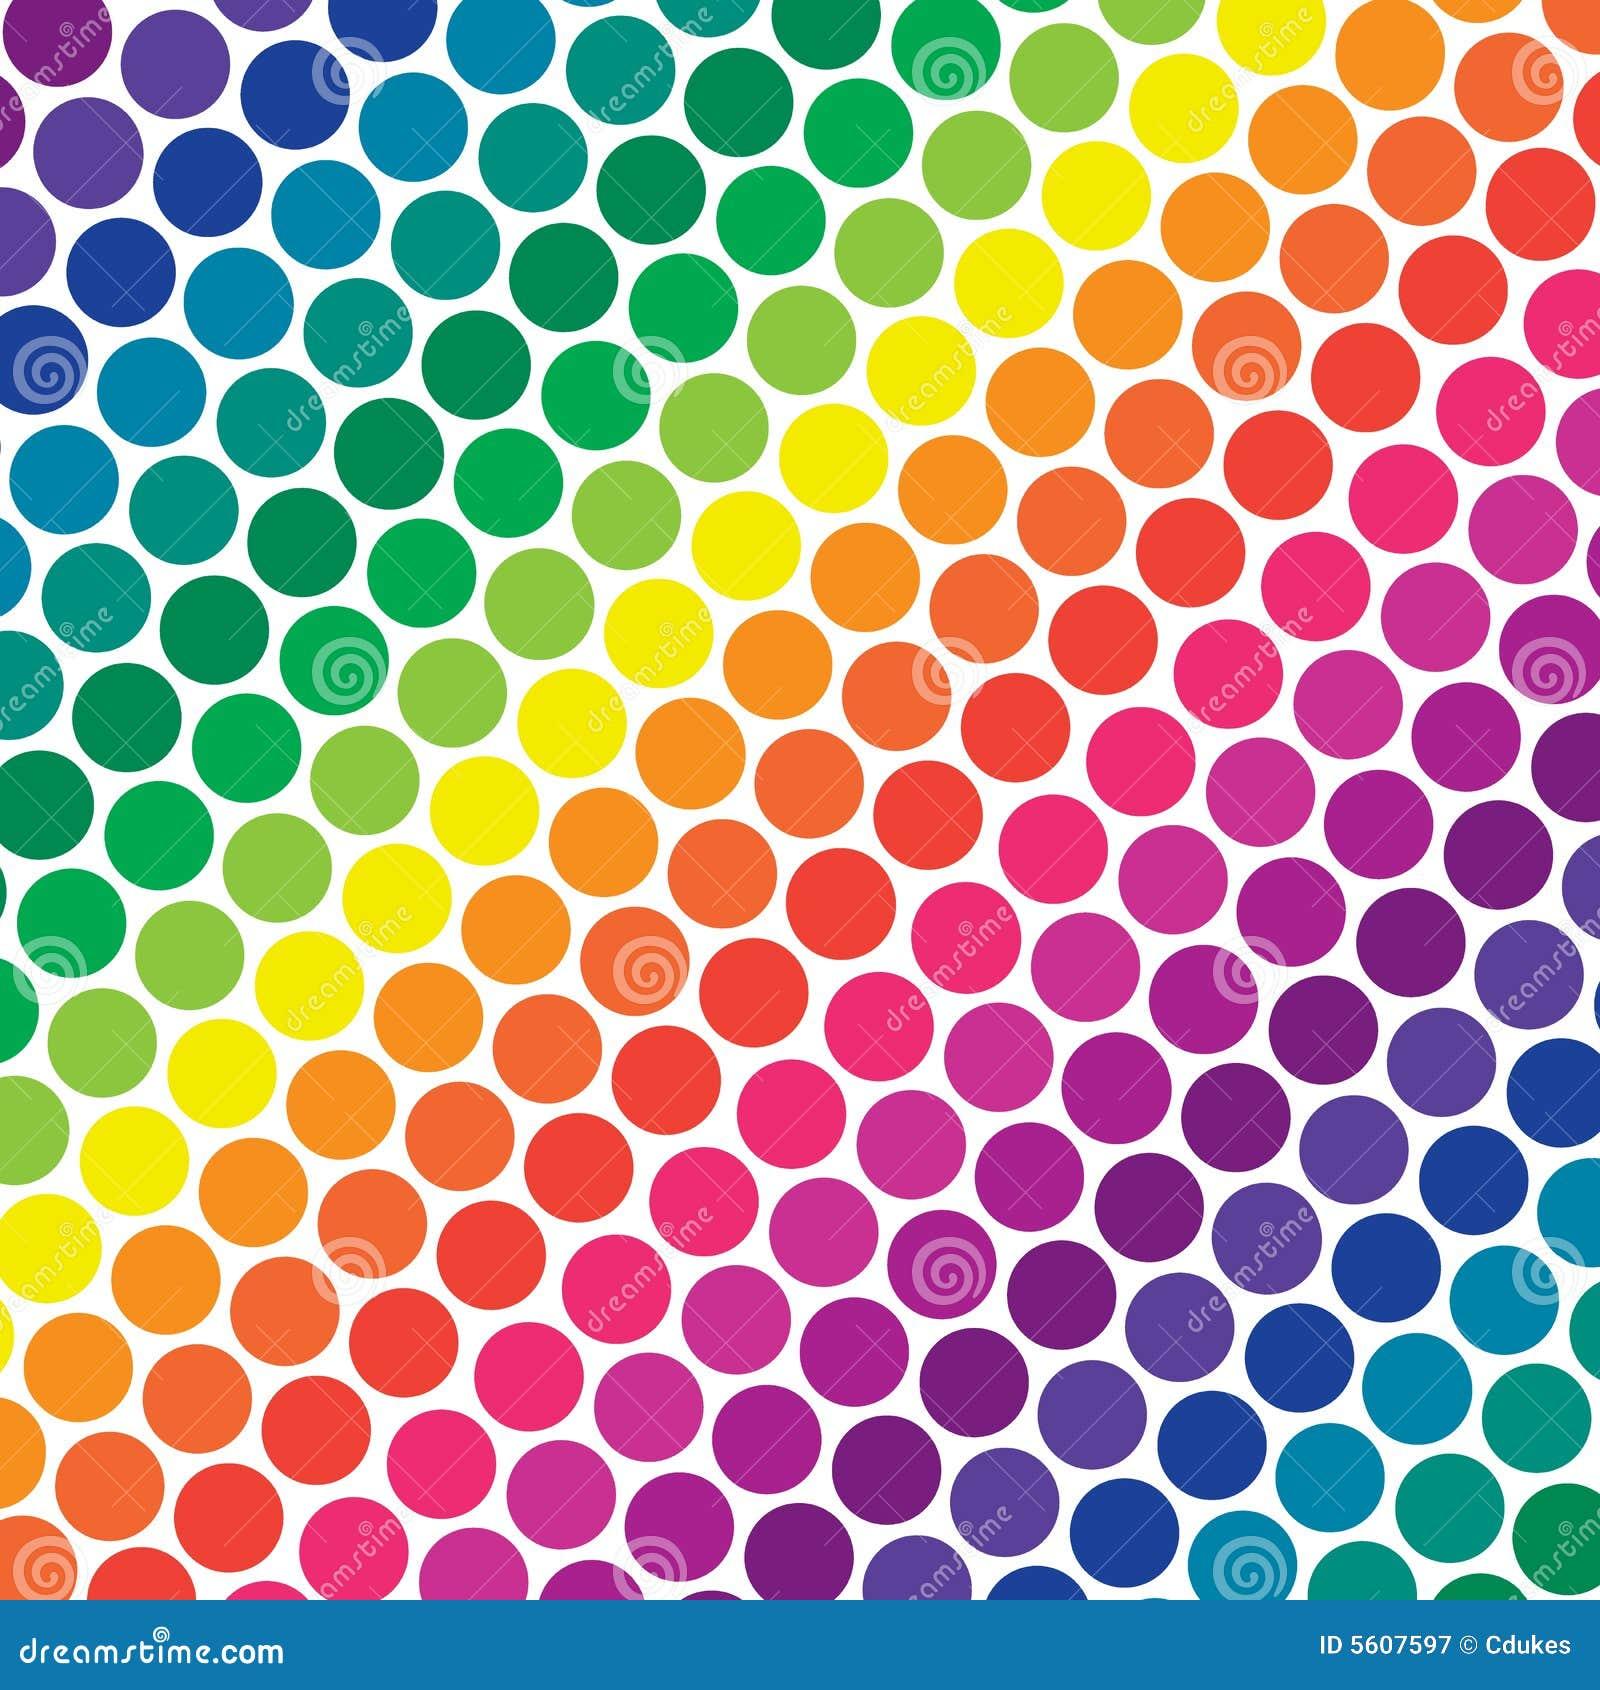 Rainbow Dots Border